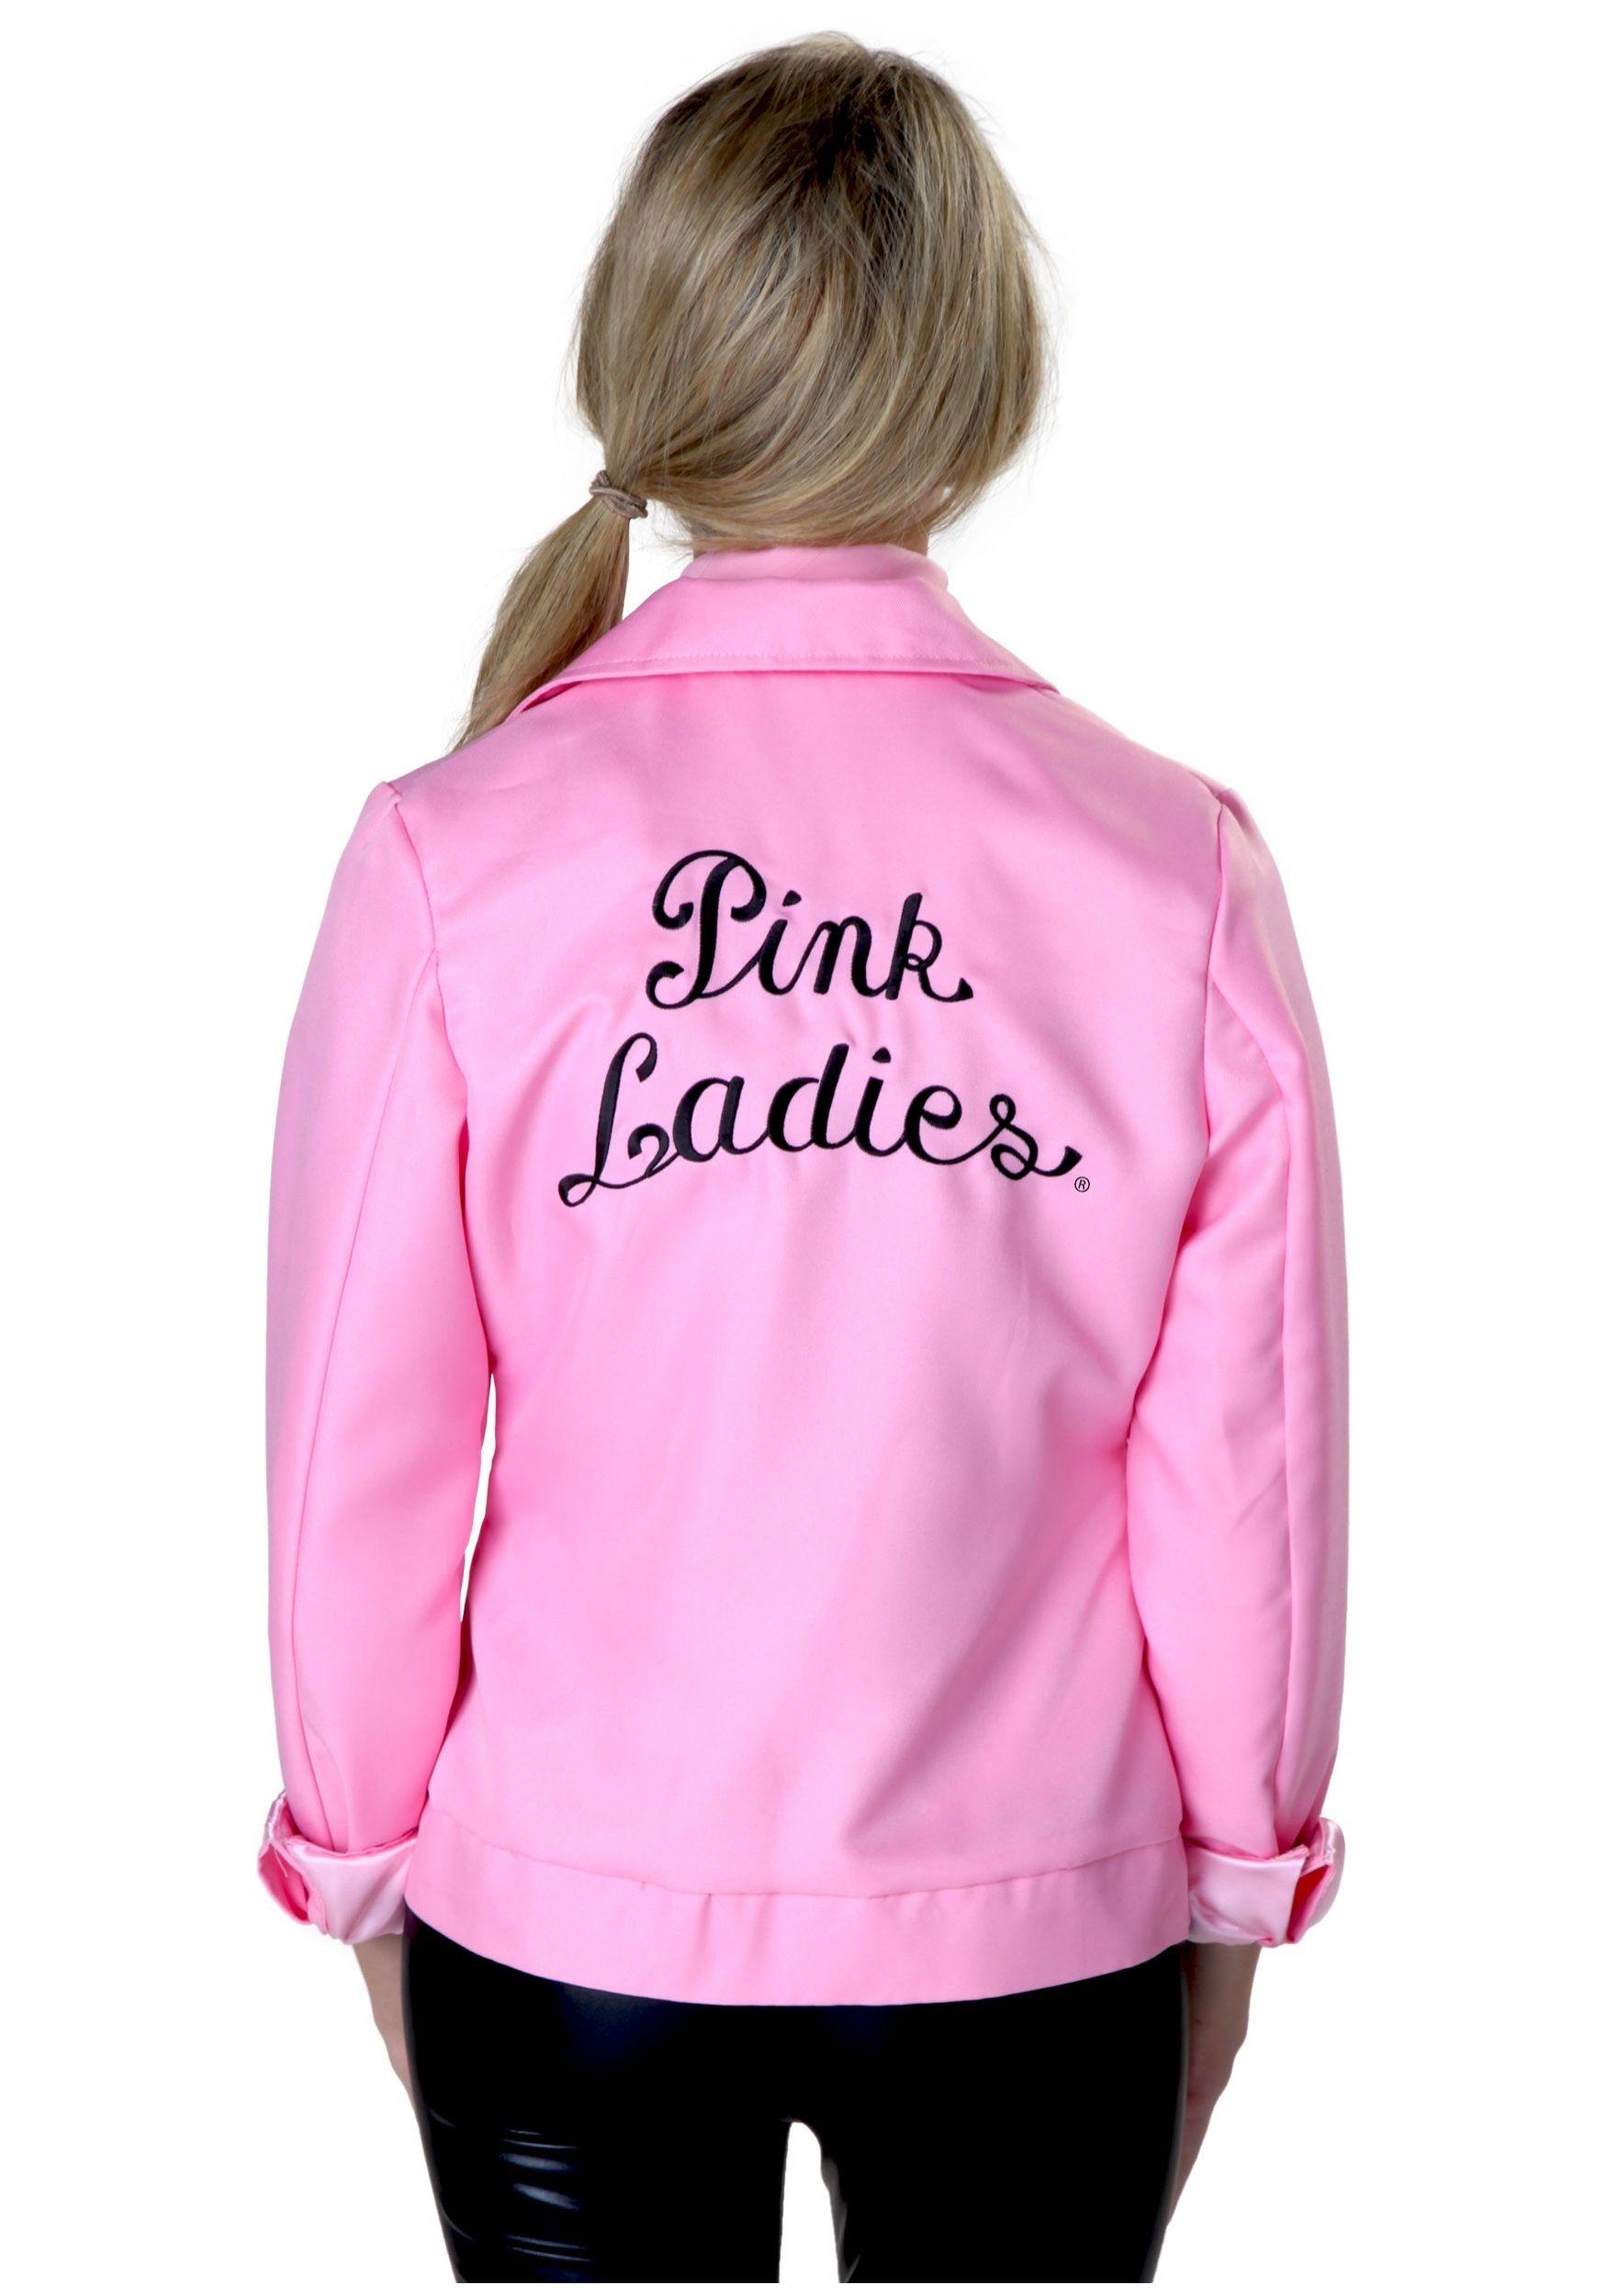 Plus Pink Ladies Authentic Size Grease Jacket nPkO0w